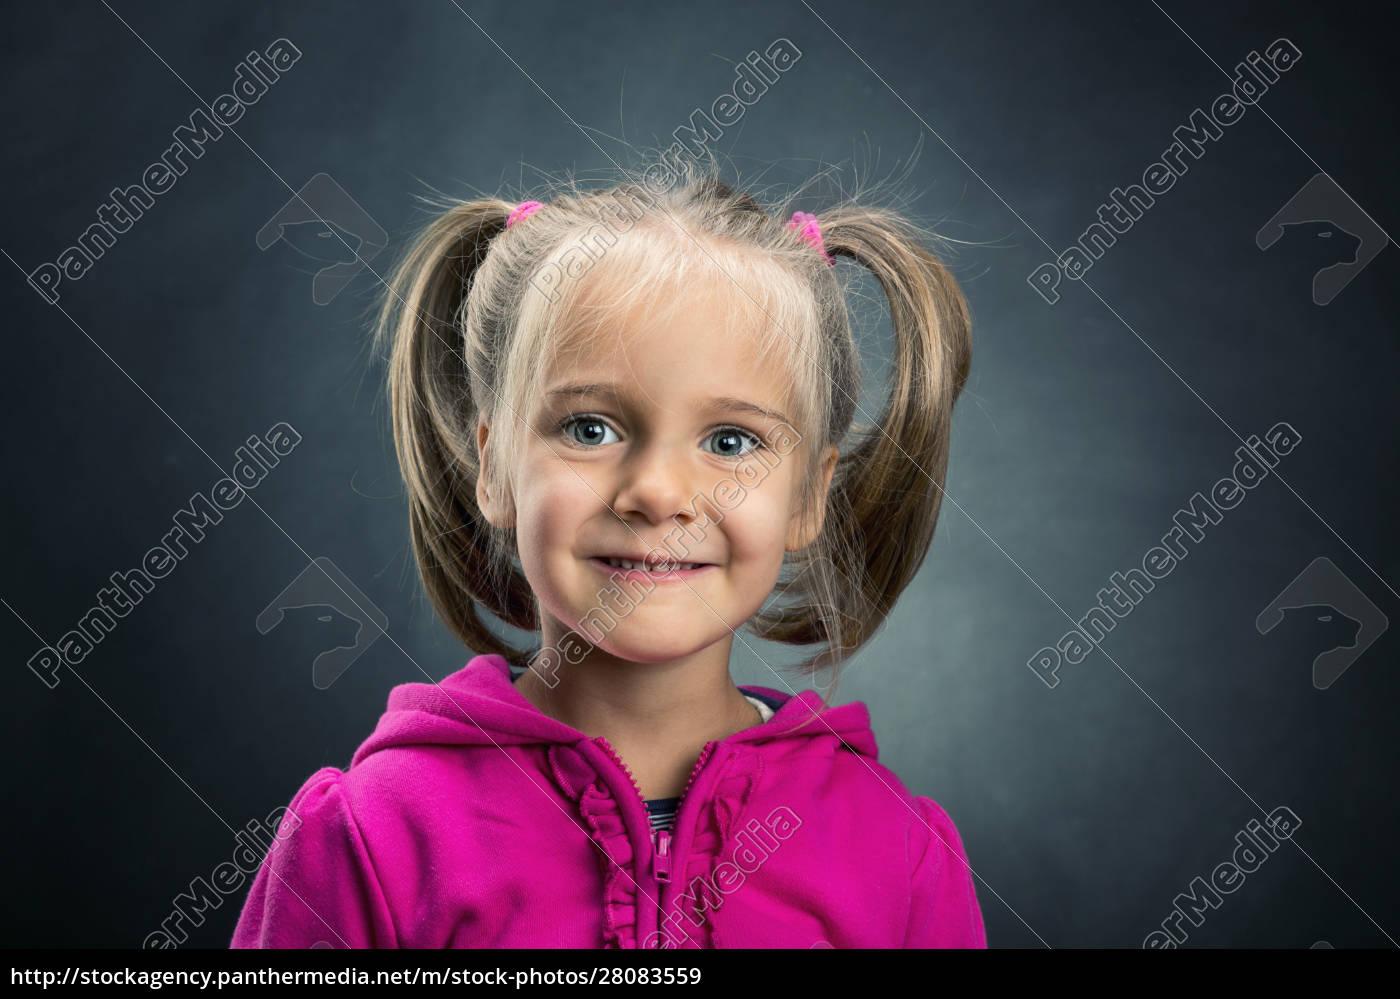 little, girl, in, rose, jacket, smiling - 28083559